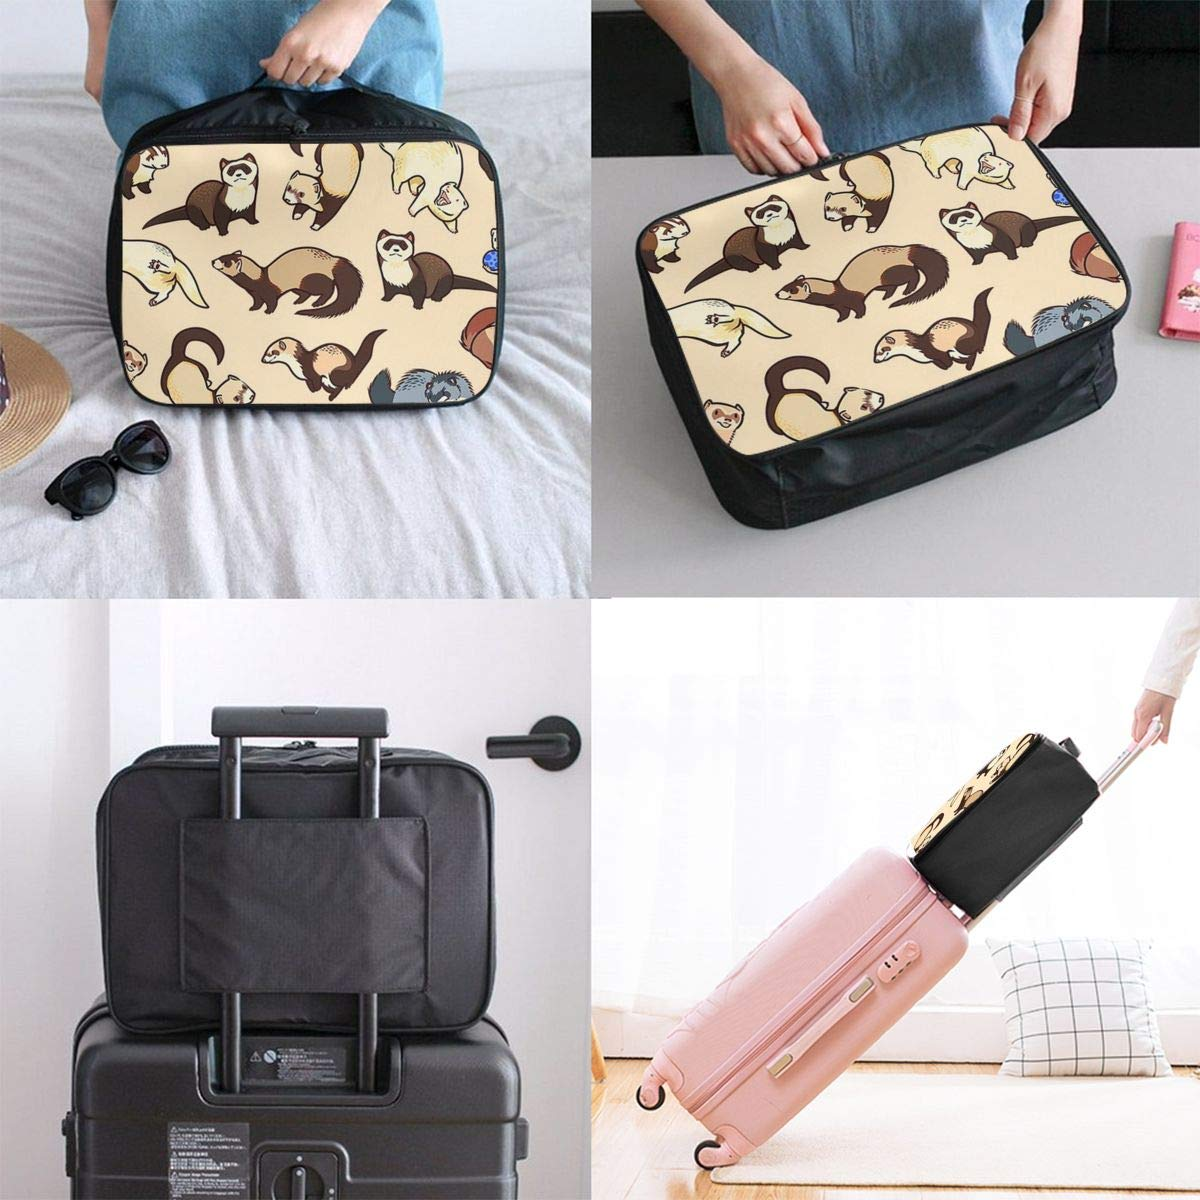 Hairy Ferret Travel Duffel Bag Casual Large Capacity Portable Luggage Bag Suitcase Storage Bag Luggage Packing Tote Bag Weekend Trip